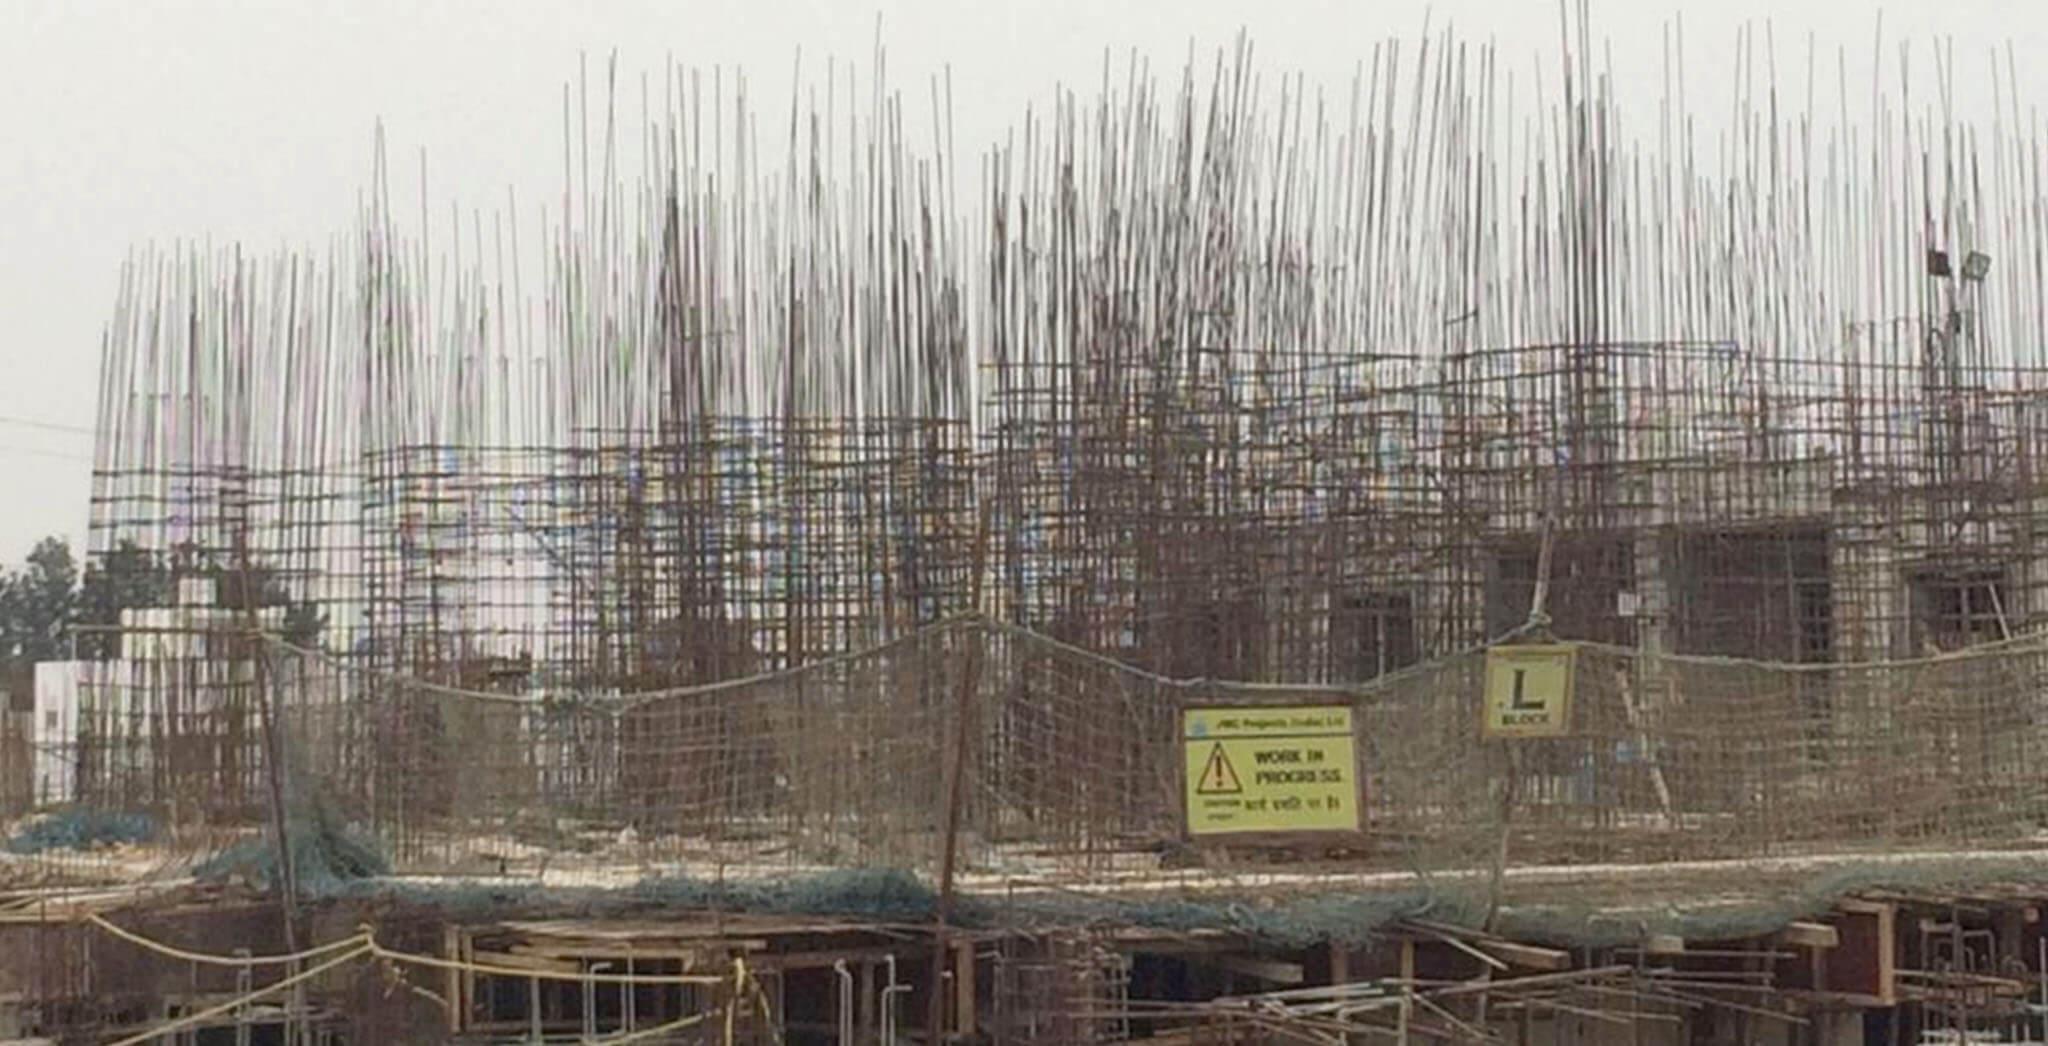 Feb 2020 - L Block: Ground floor slab in progress